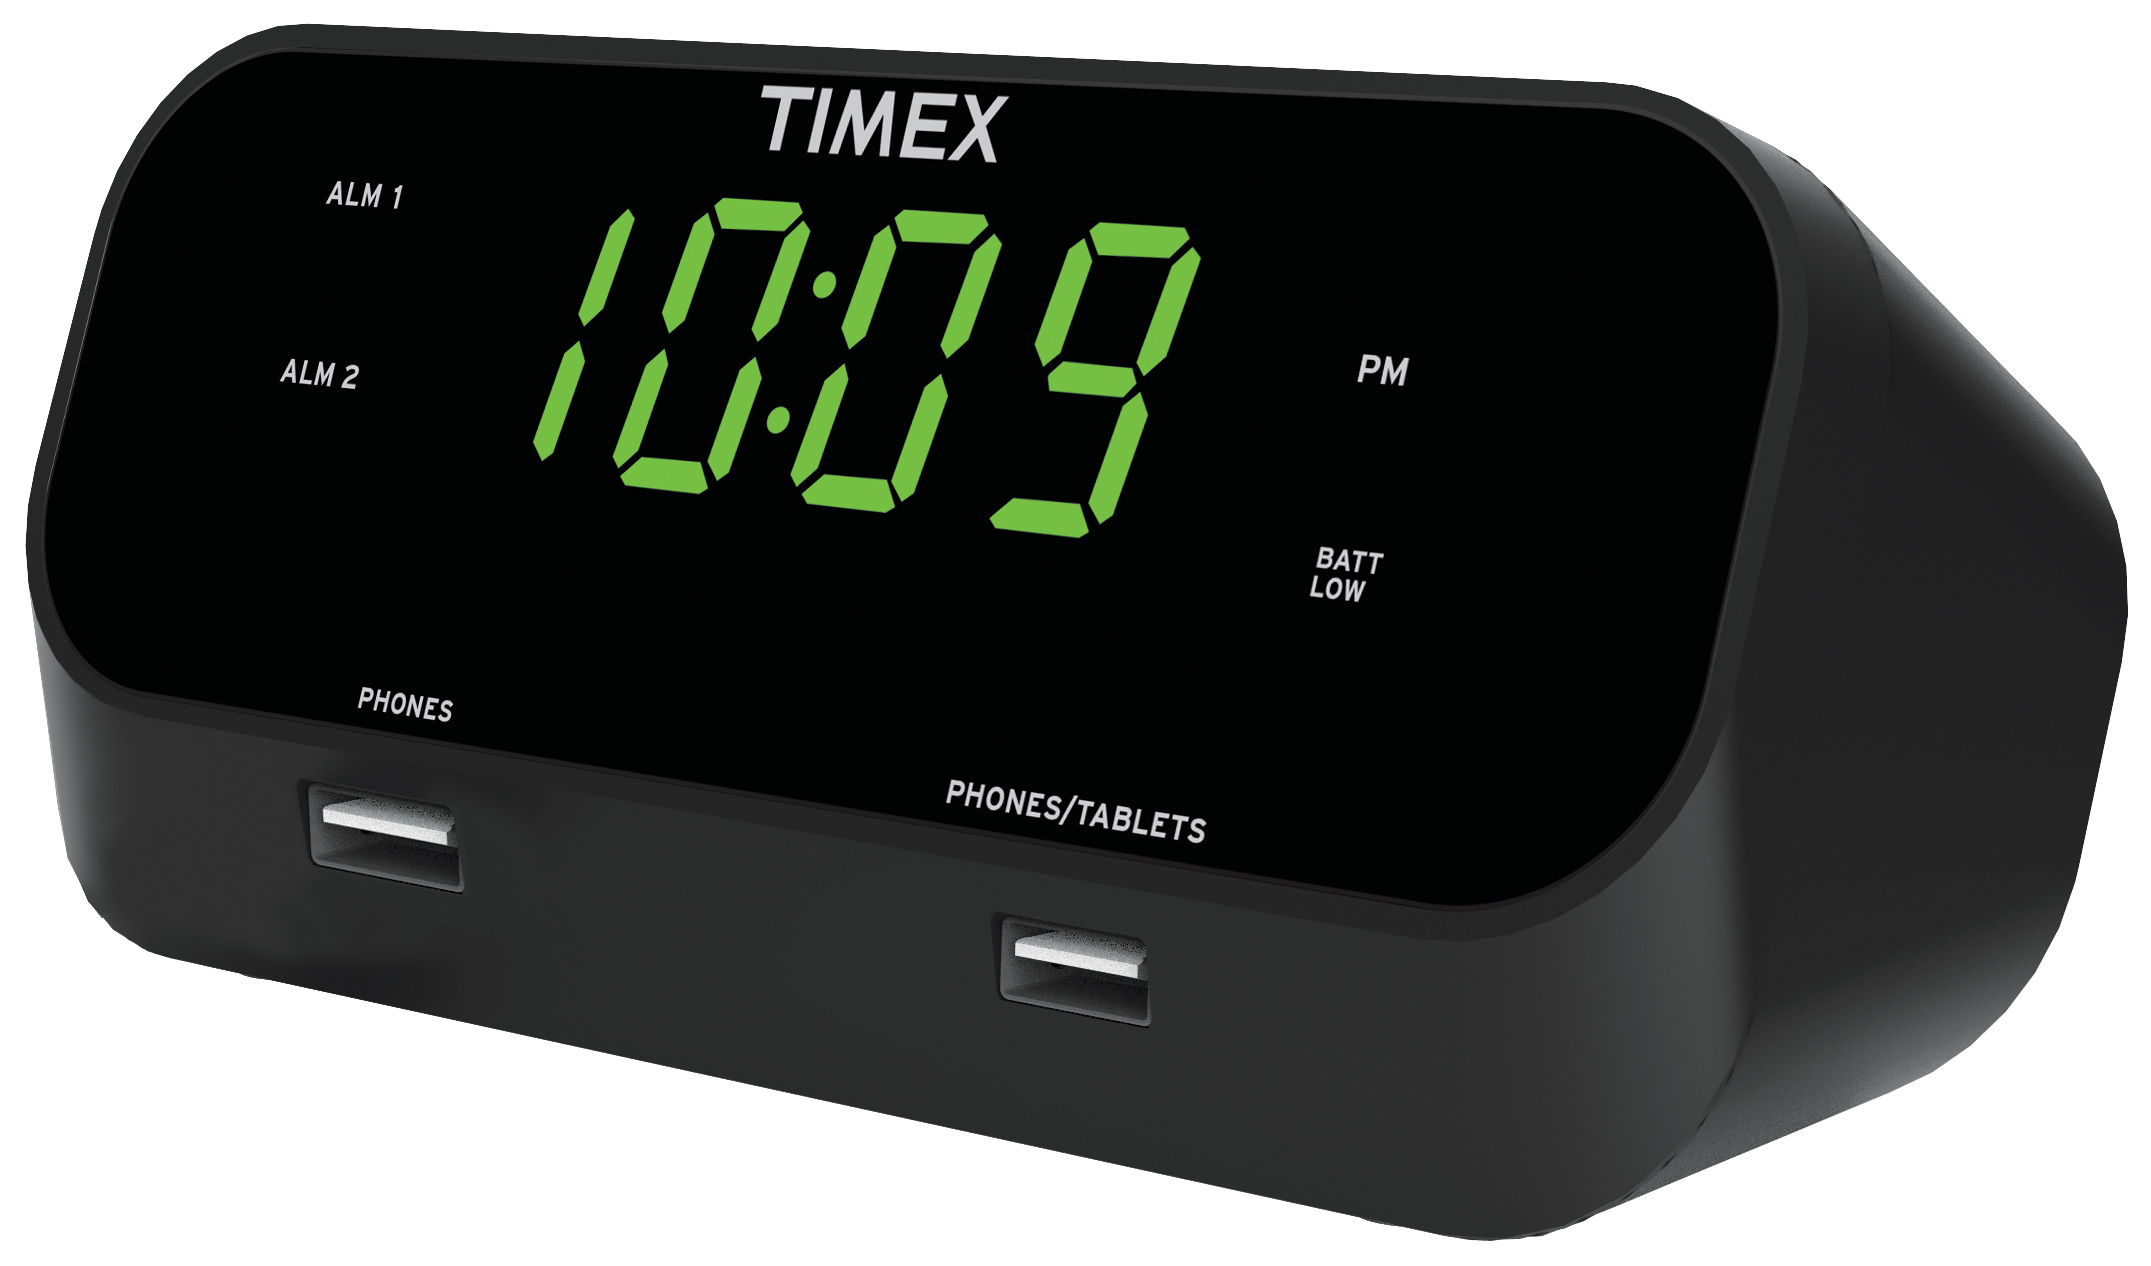 Timex Alarm Clock Dual USB Charging Phone Tablet RediSet Dual Alarms LED Display